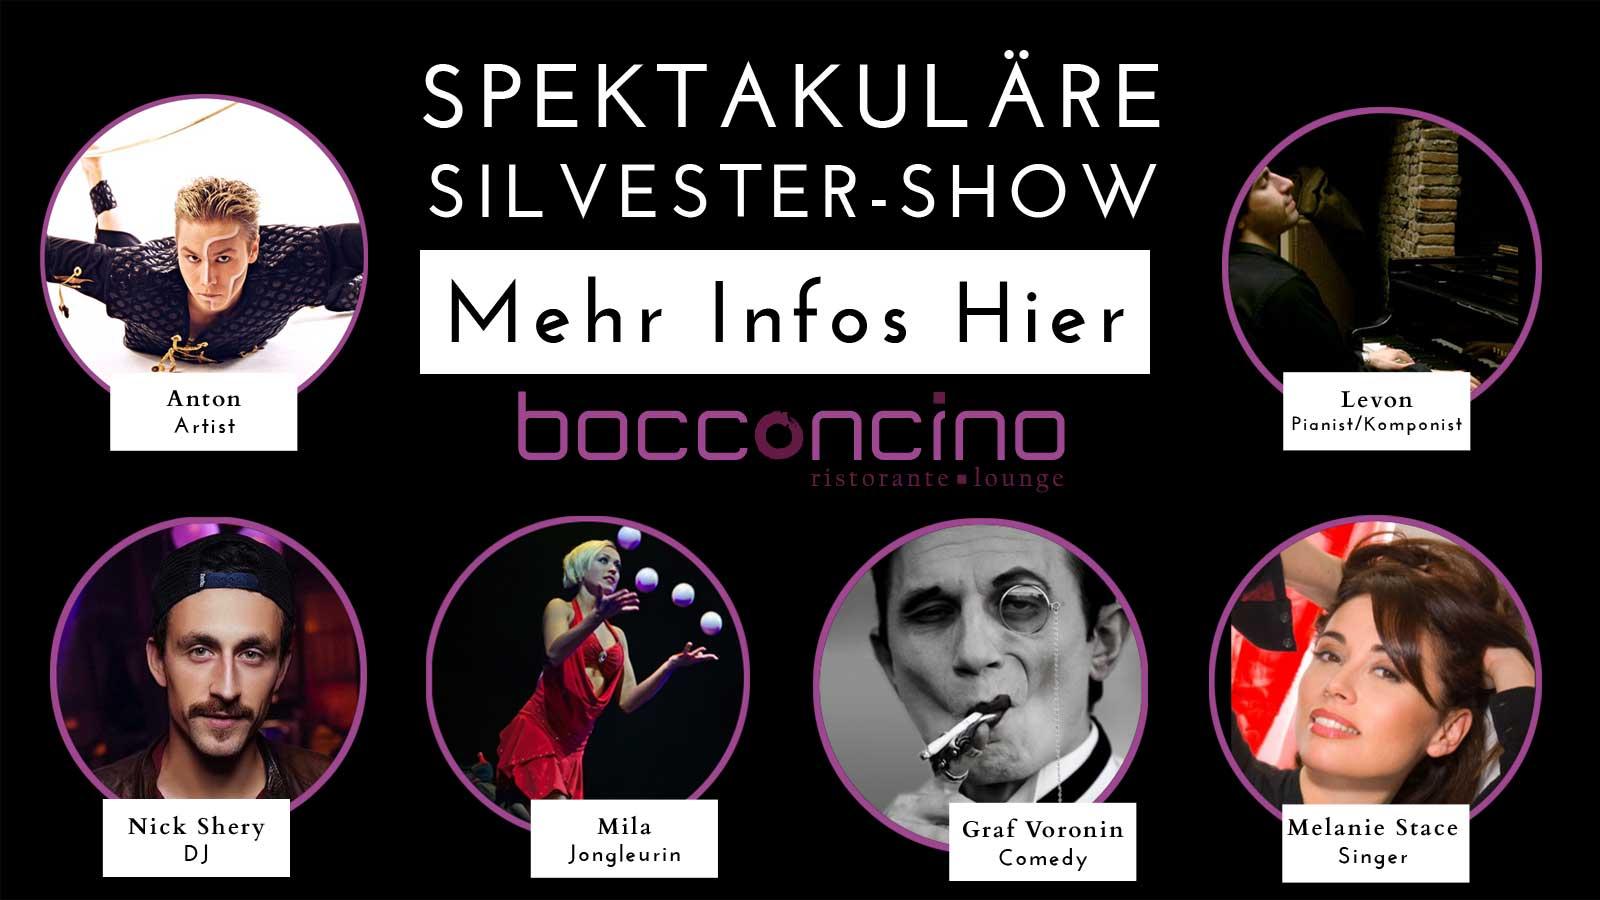 silvesterkarte eventprod - SILVESTER GALA SHOW 2017 IM BOCCONCINO DÜSSELDORF